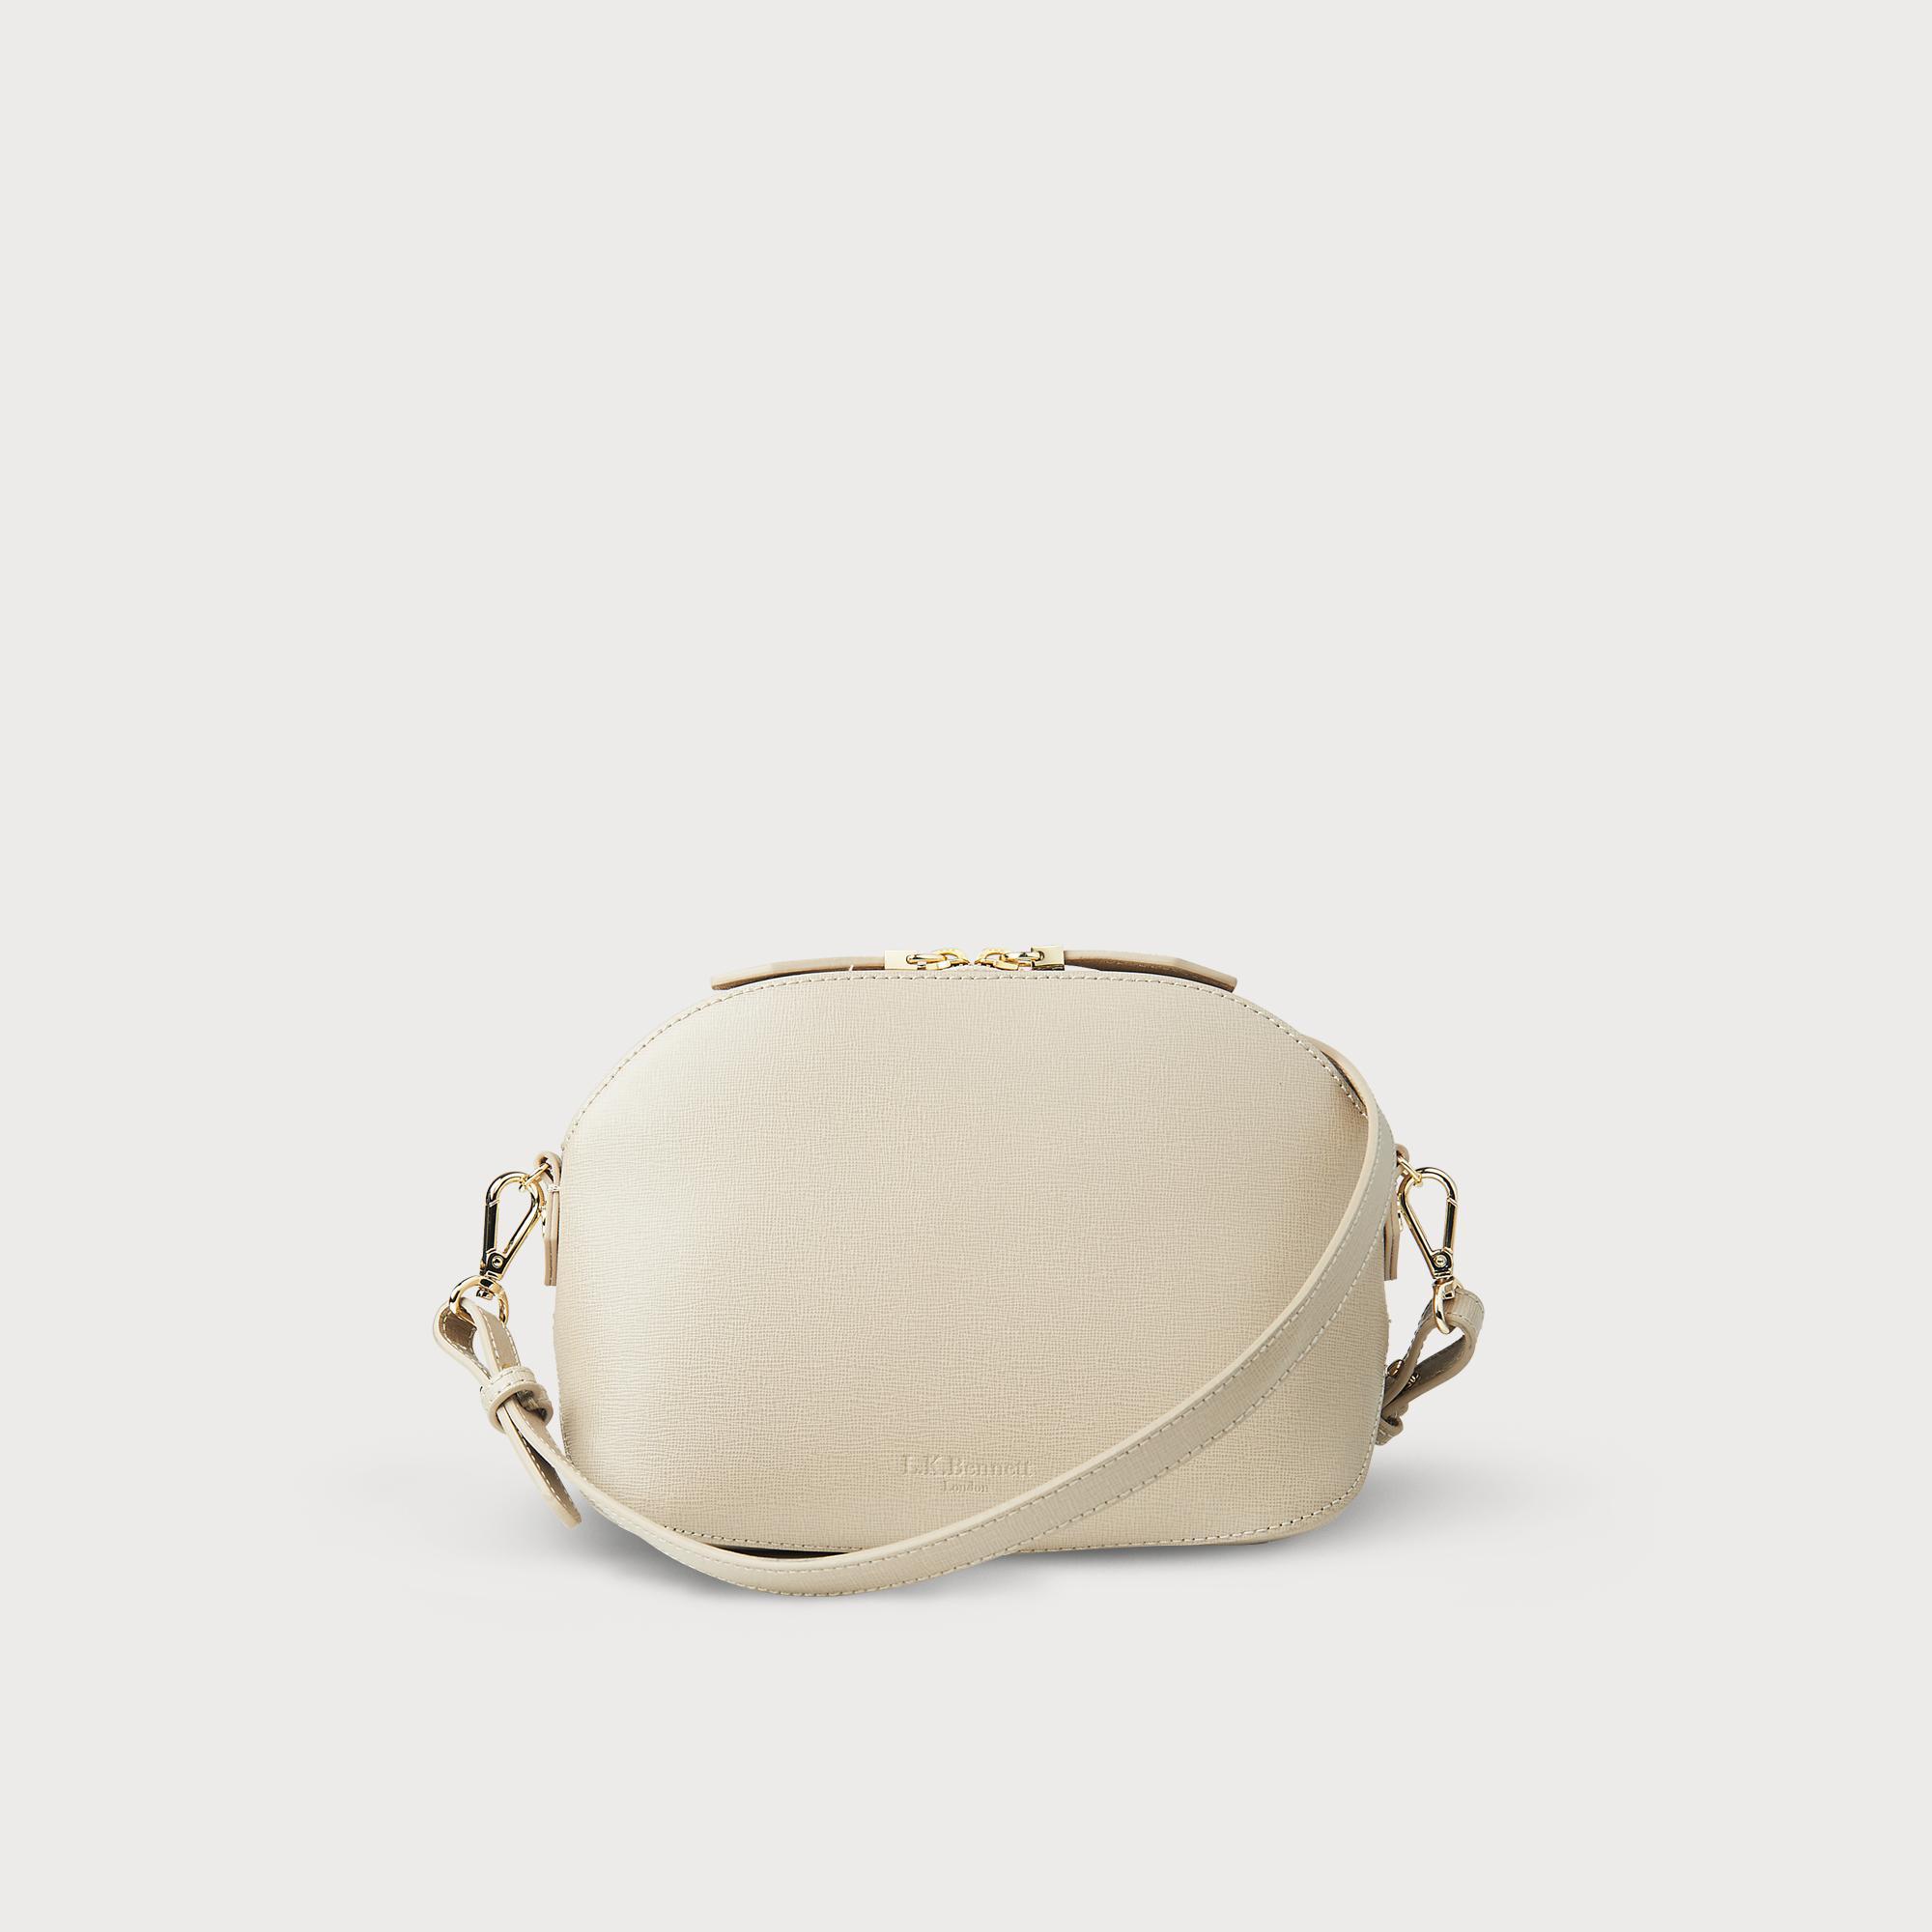 Candice Taupe Leather Shoulder Bag